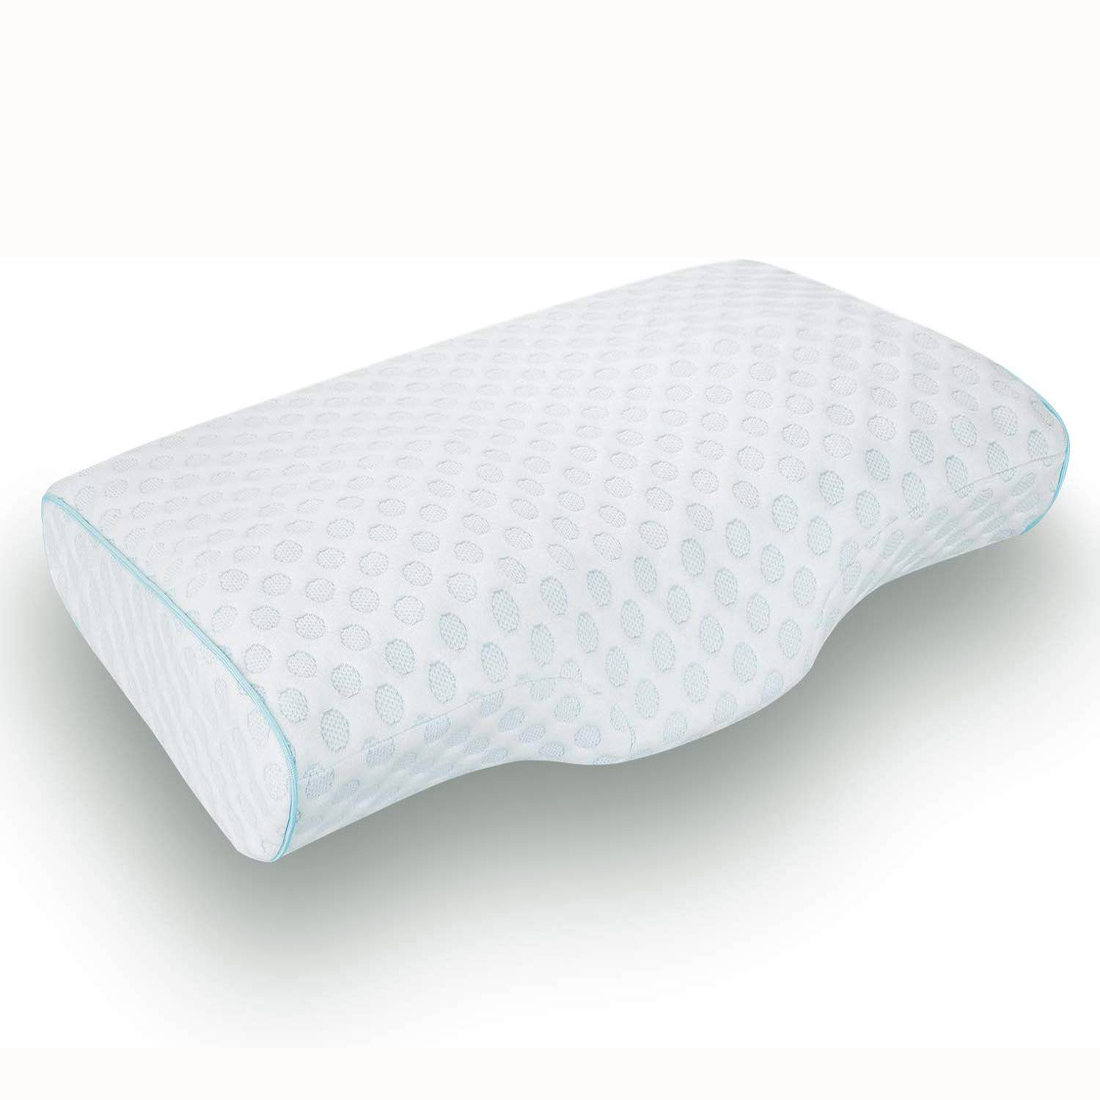 best pillow for neck and shoulder pain lerekam